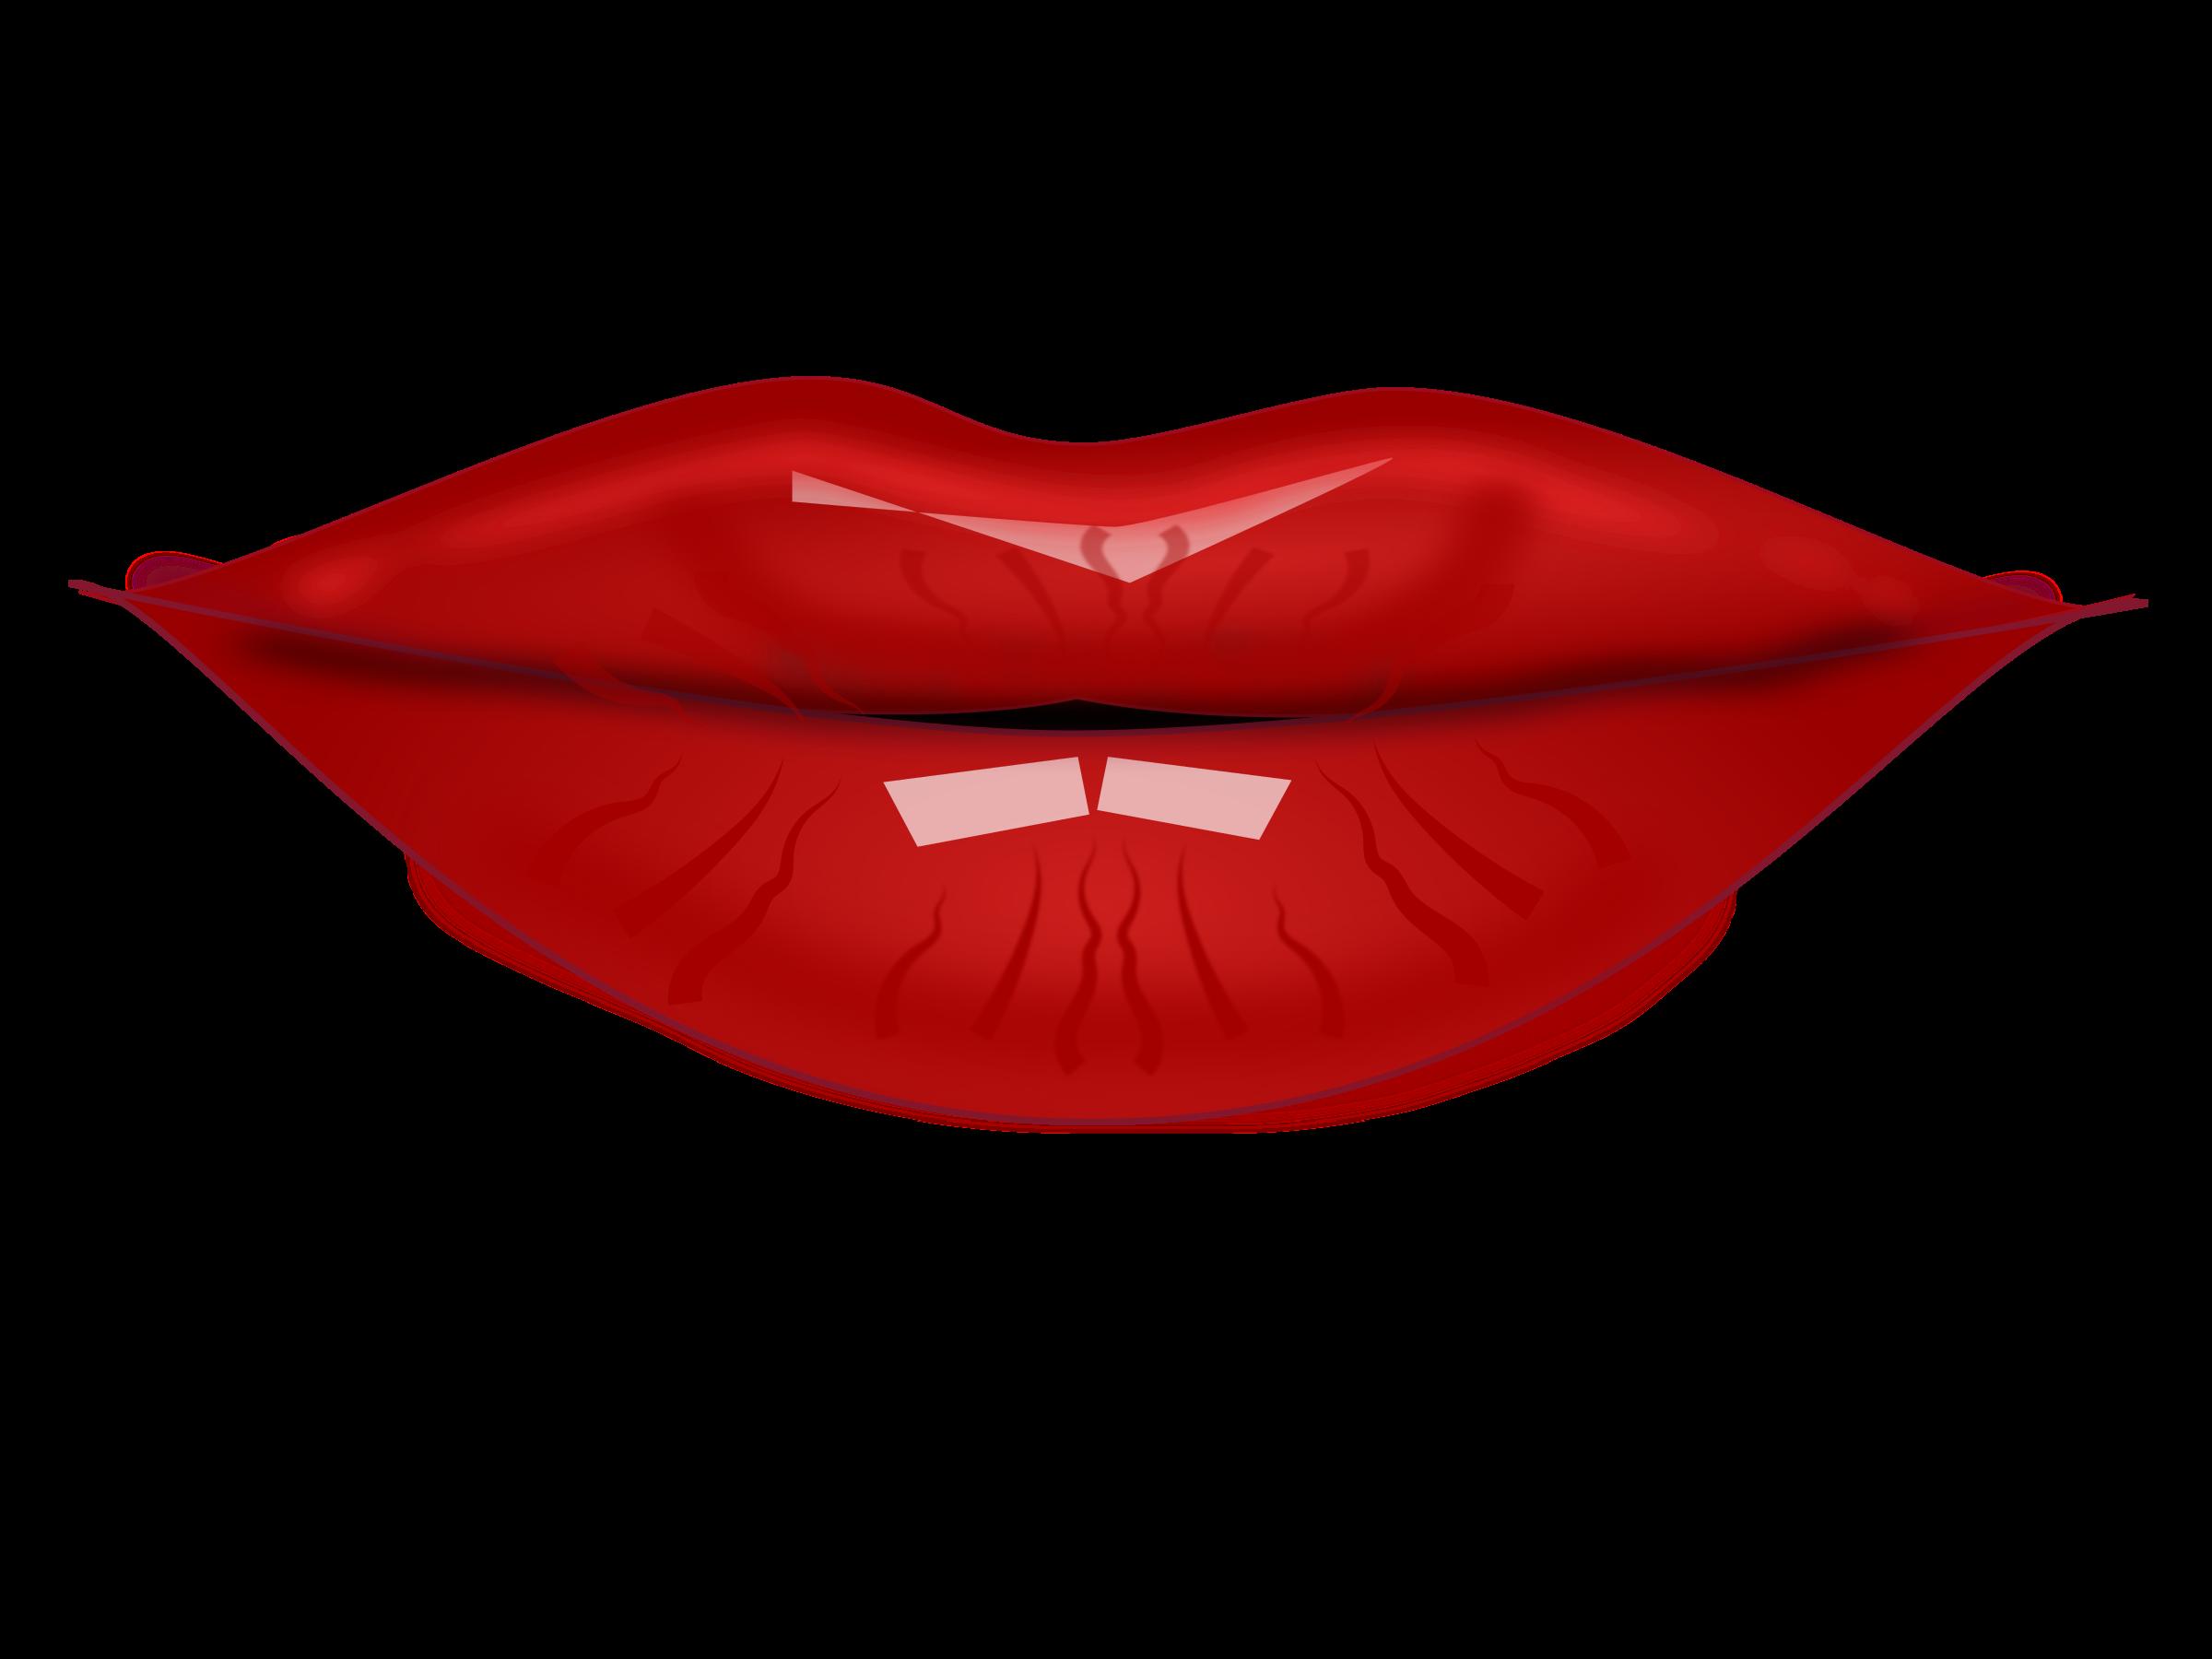 2400x1800 Clipart Lips By Netalloy